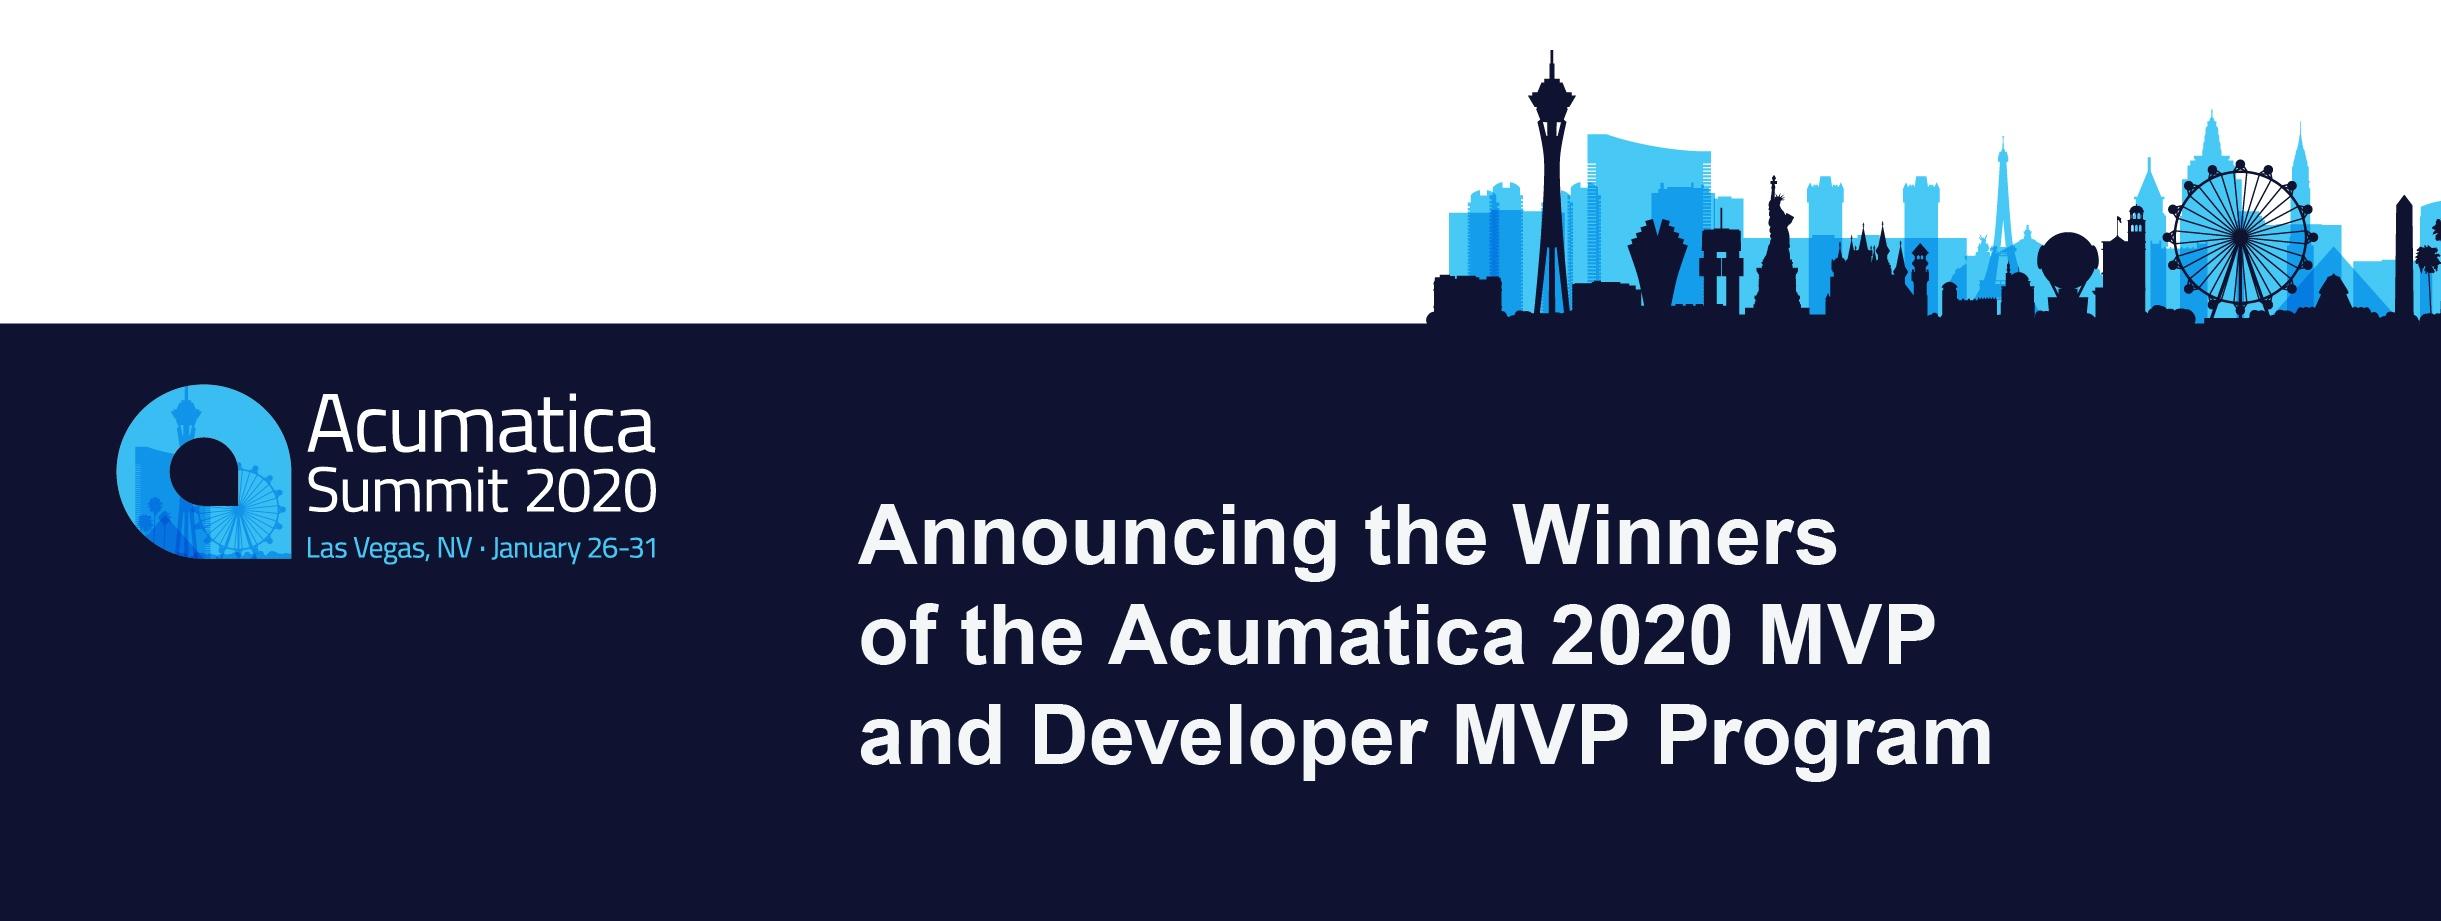 Announcing the Winners of the Acumatica 2020 MVP and Developer MVP Program